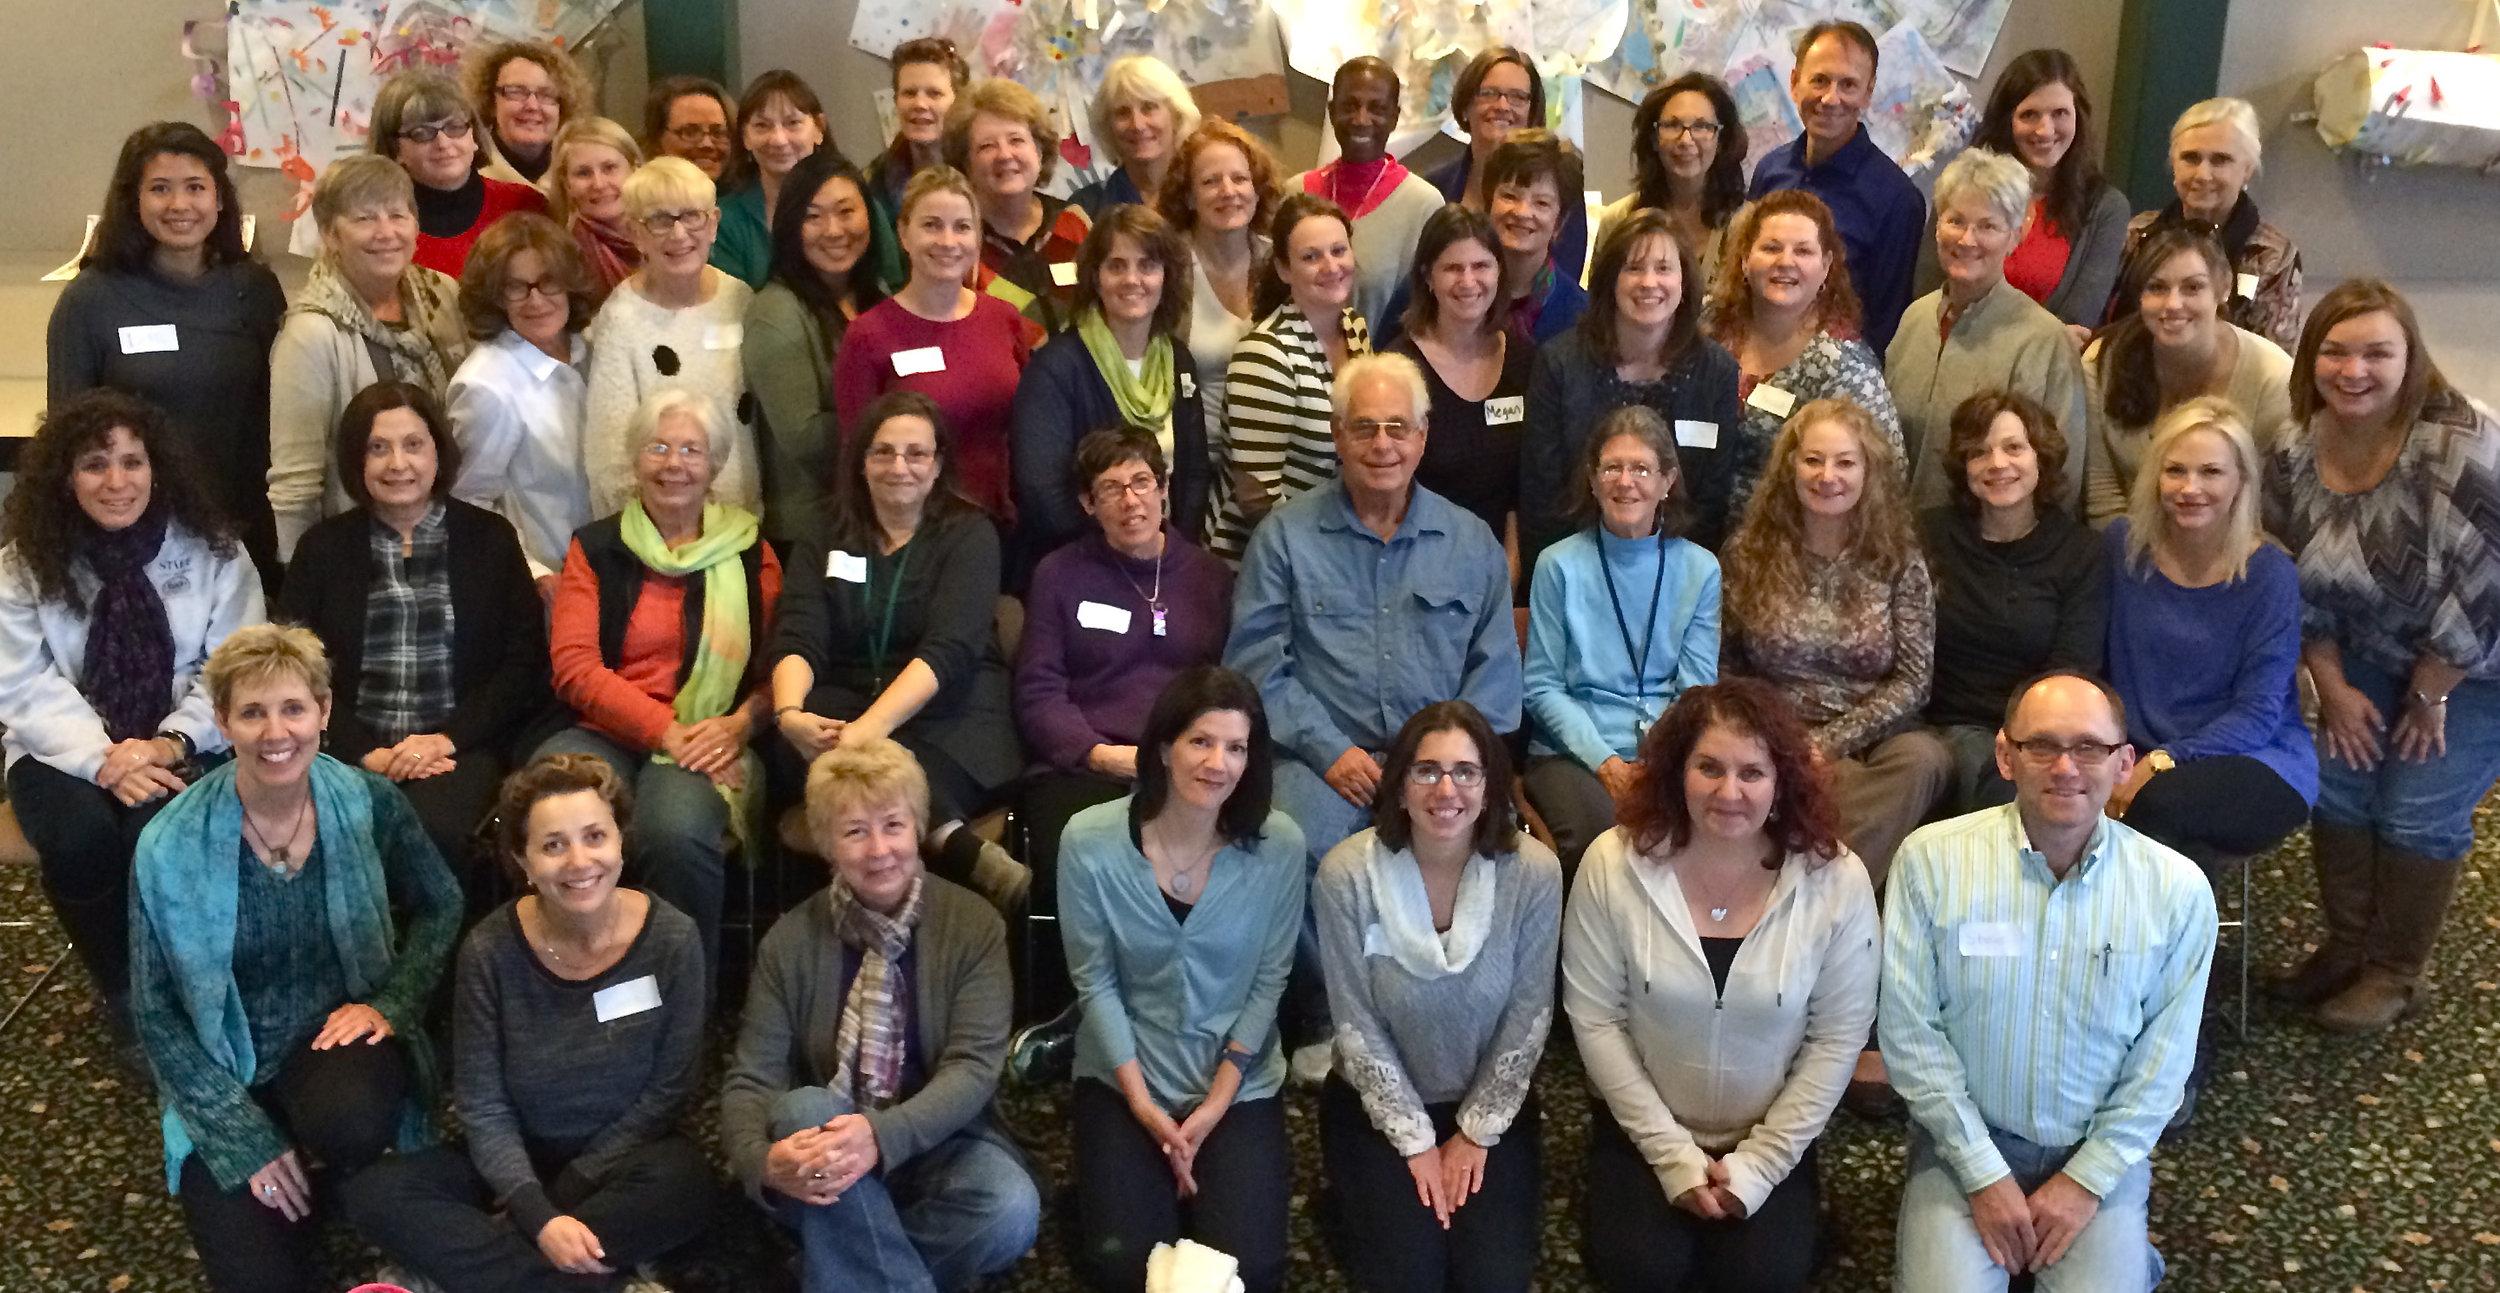 2014 Retreat participants Kansas City, MO